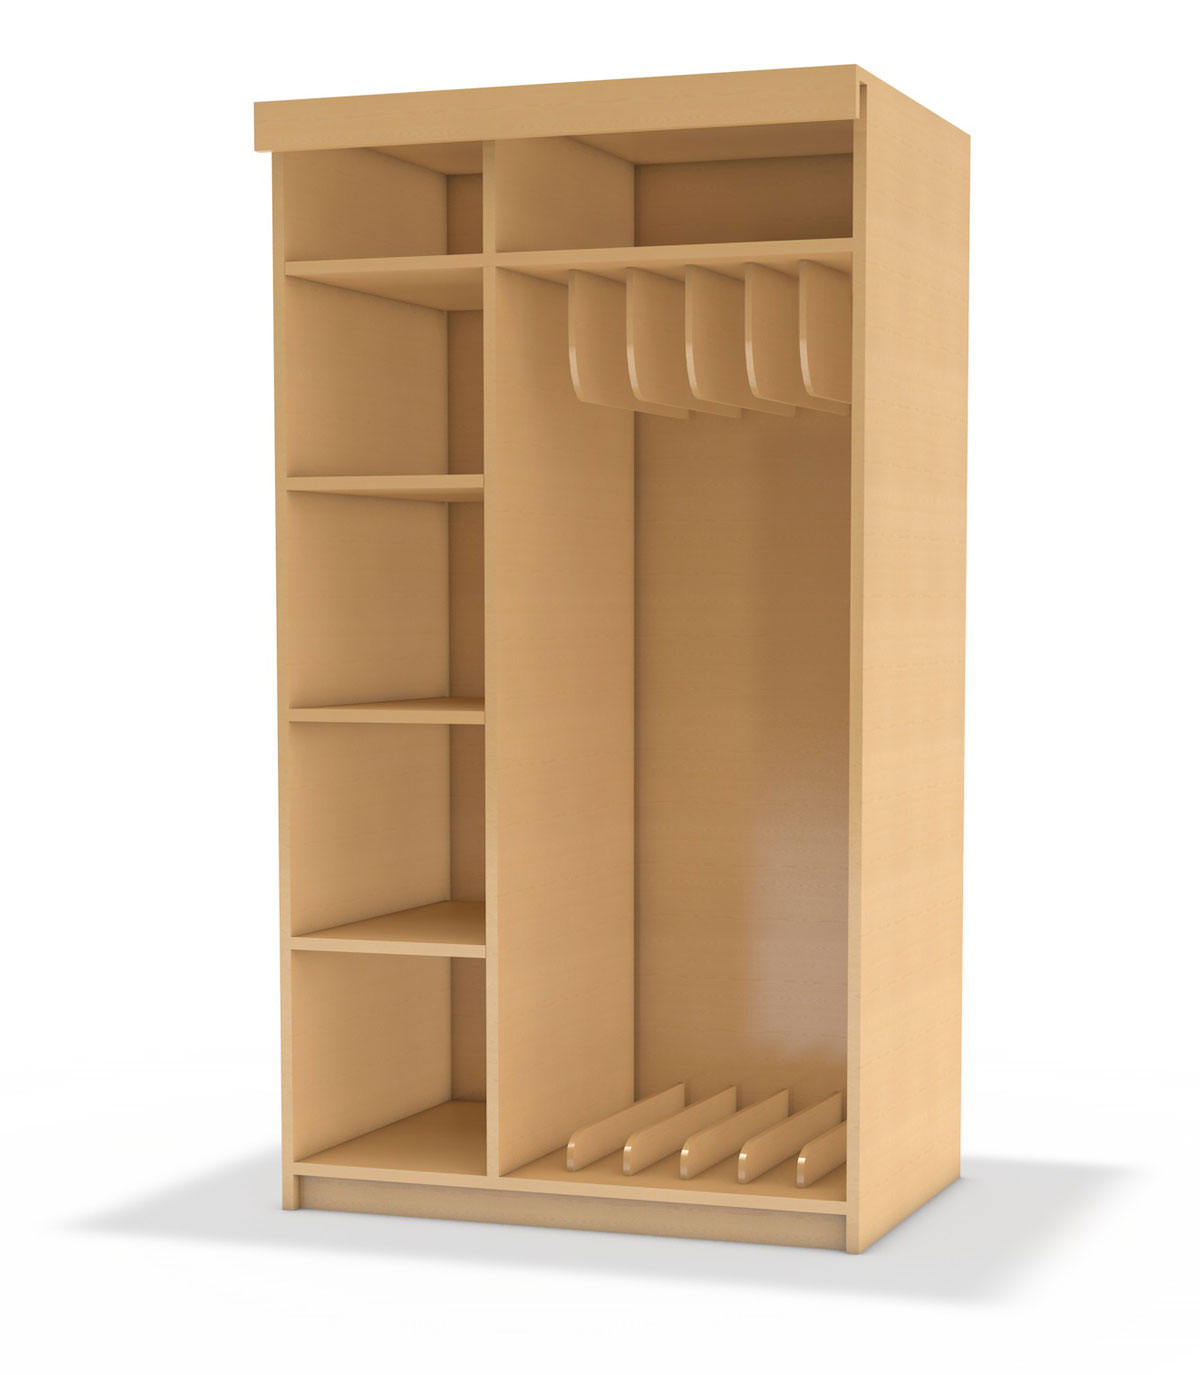 liegepolsterschrank in korpusbauweise korpus classic. Black Bedroom Furniture Sets. Home Design Ideas